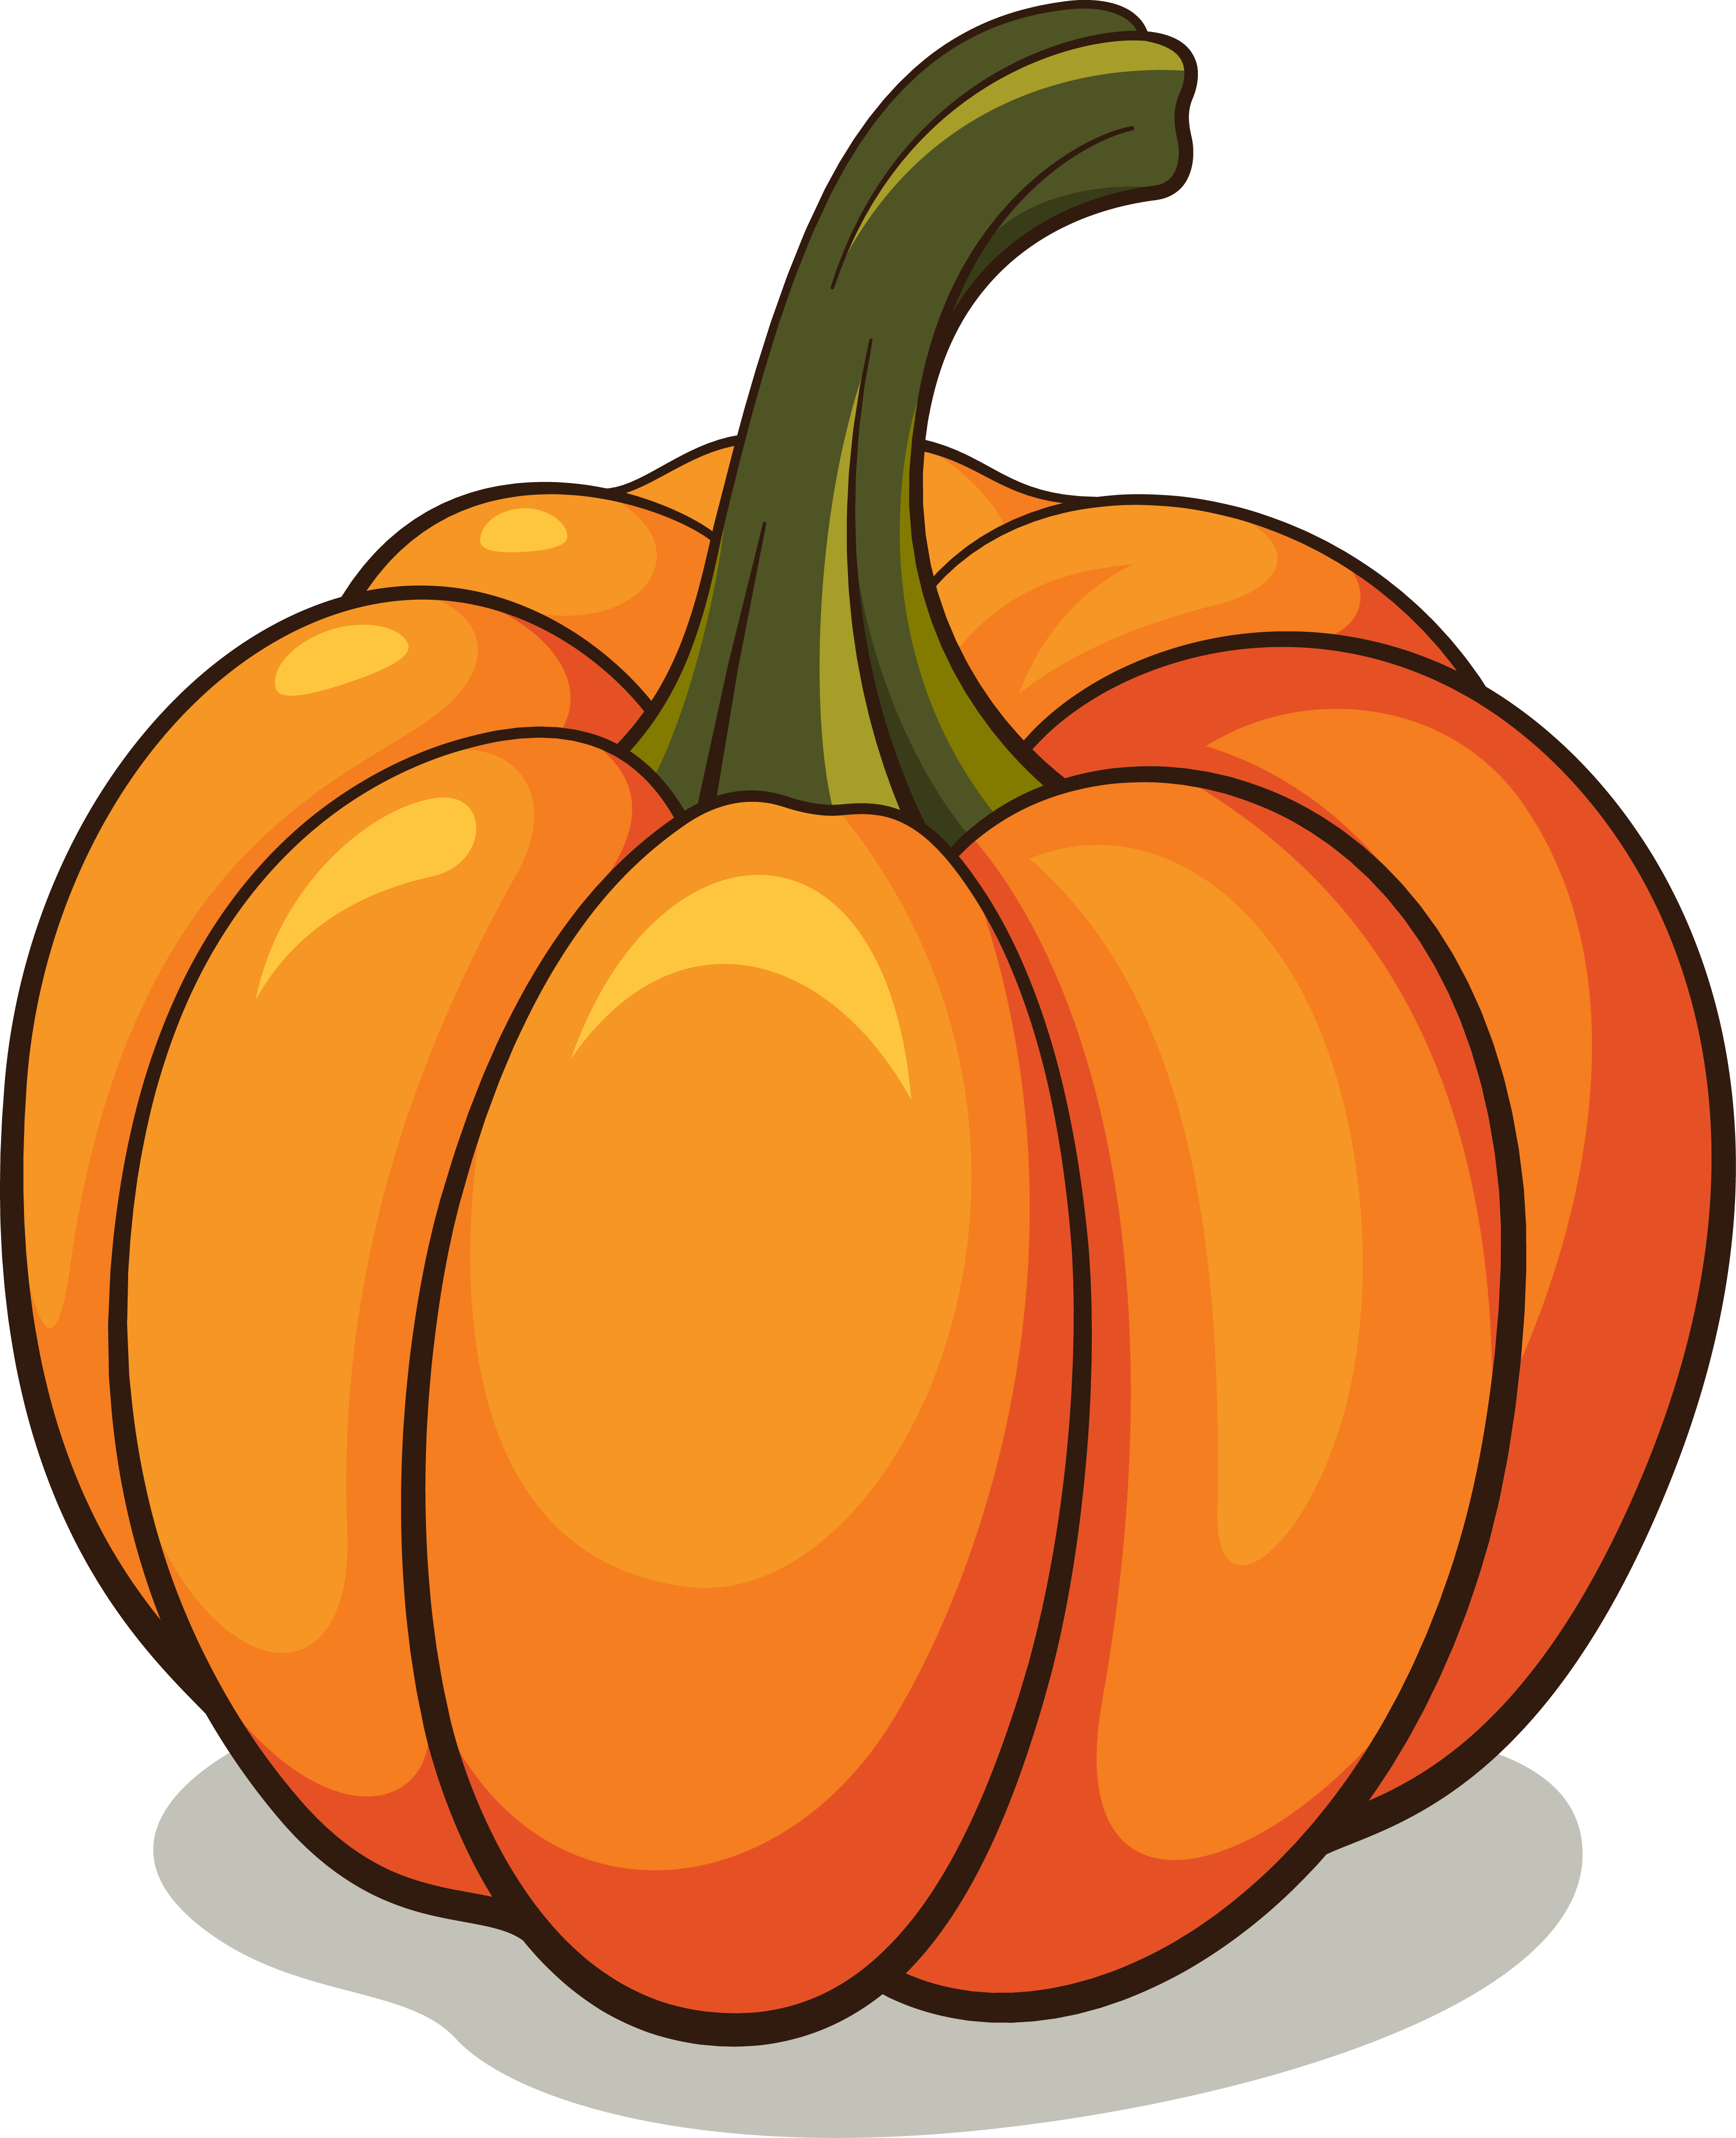 Png image purepng free. Clipart pumpkin vegetable